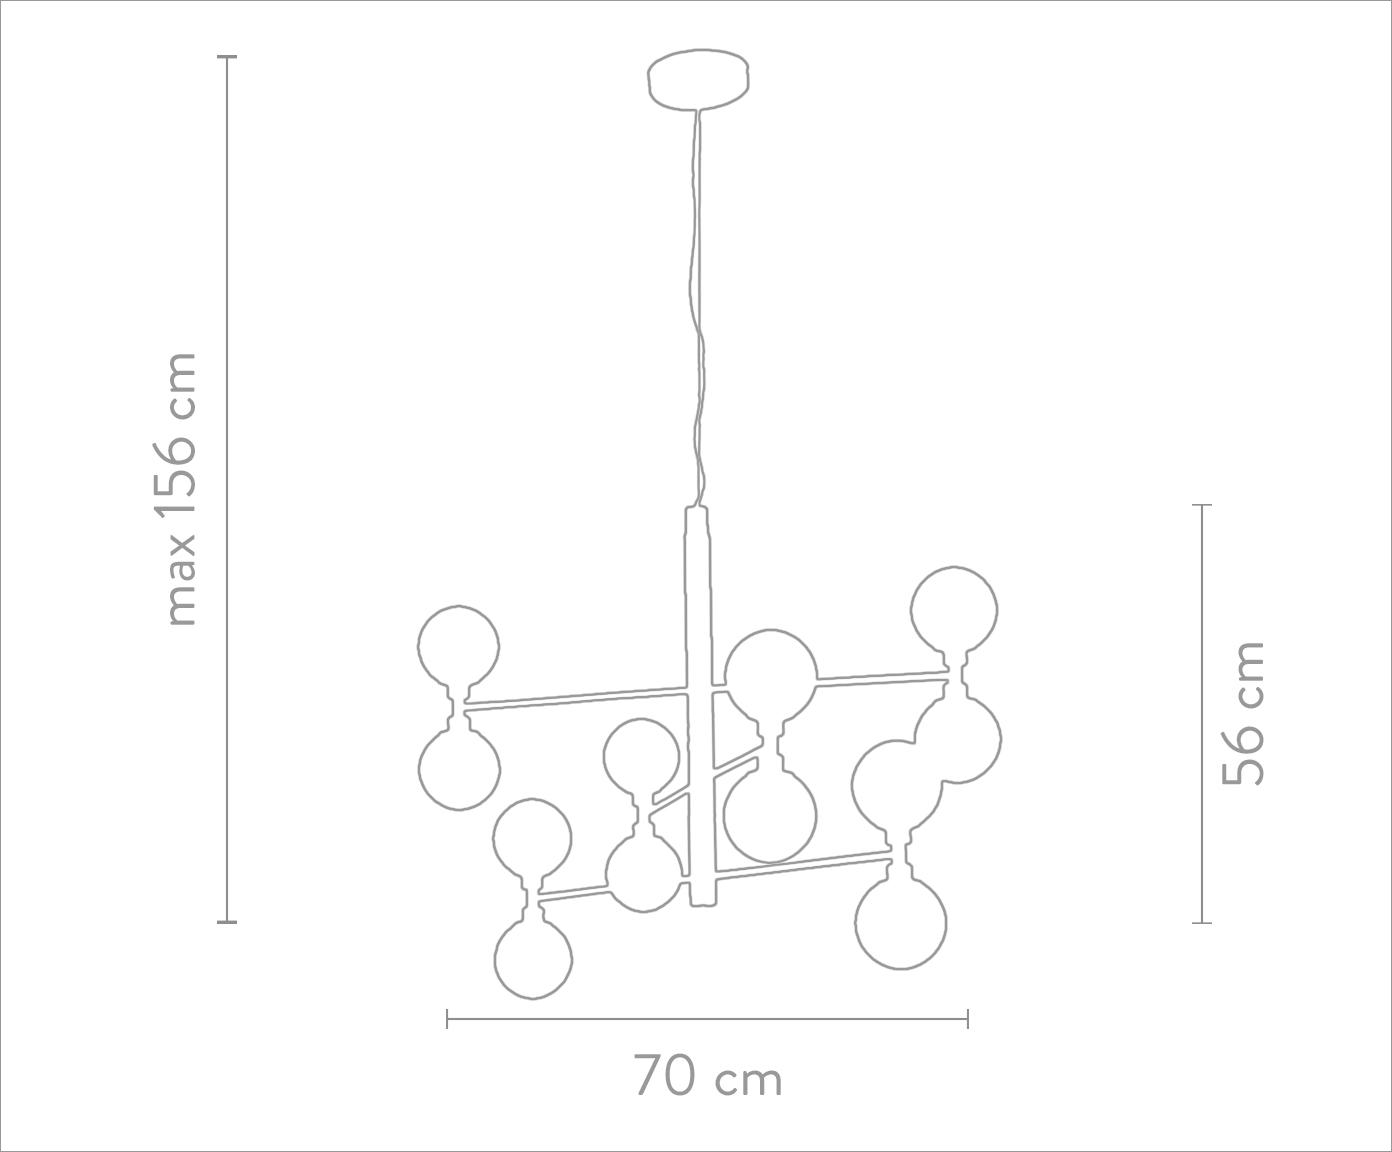 Glaskugel-Pendelleuchte Grover, Baldachin: Metall, Goldfarben, Ø 70 x H 56 cm